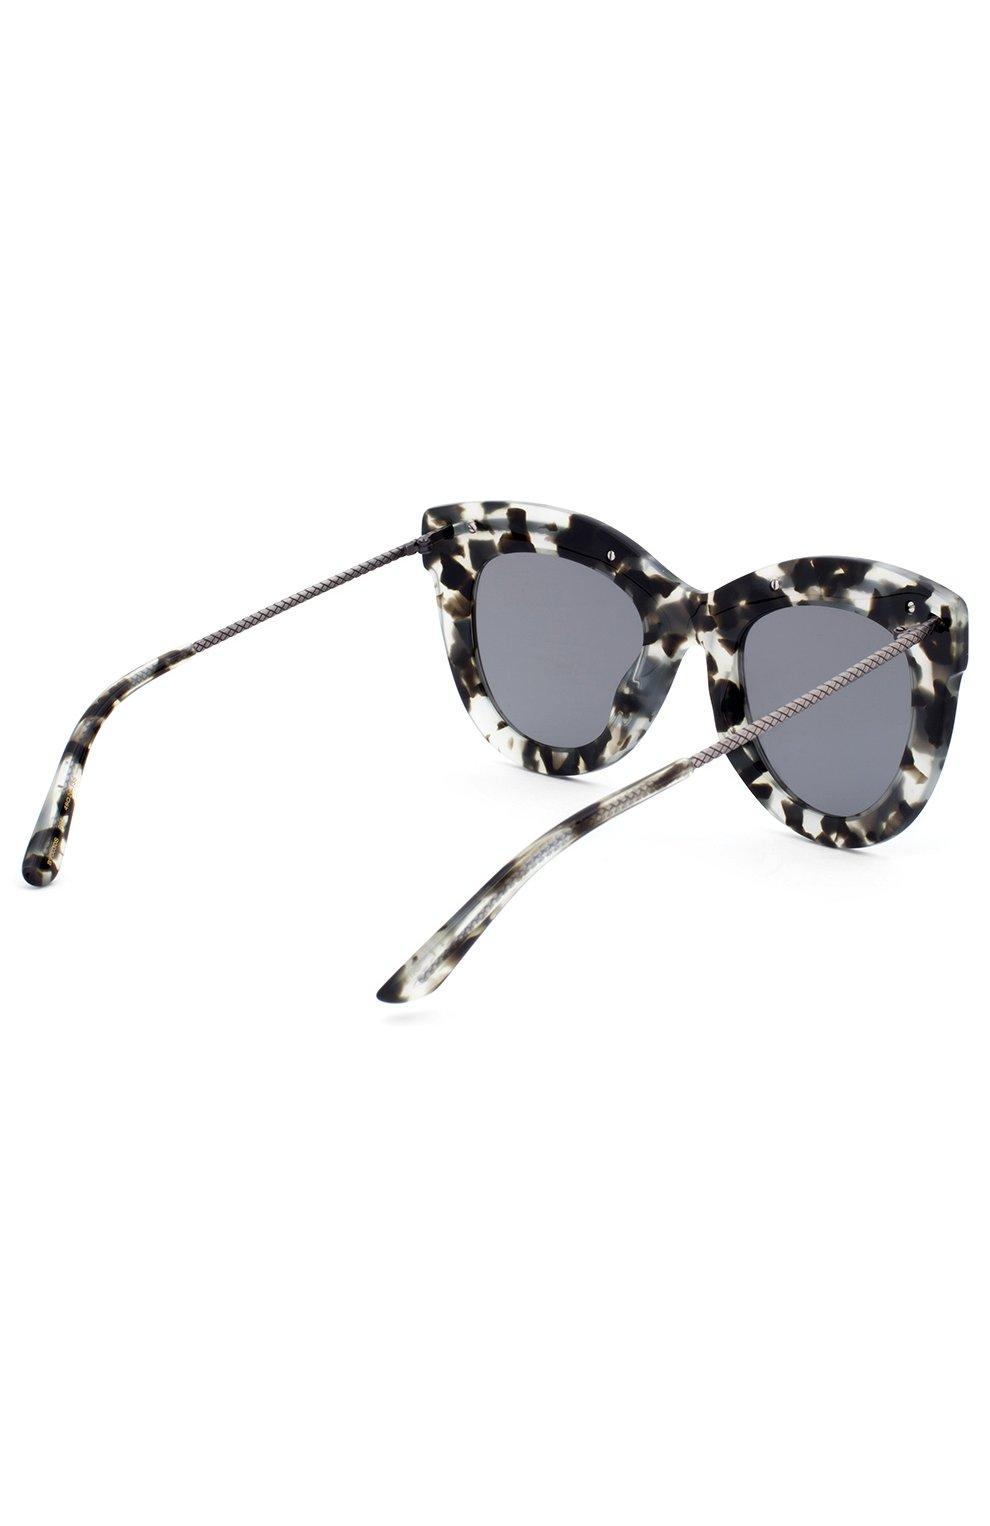 Женские солнцезащитные очки BOTTEGA VENETA хаки цвета, арт. 0030 005 | Фото 3